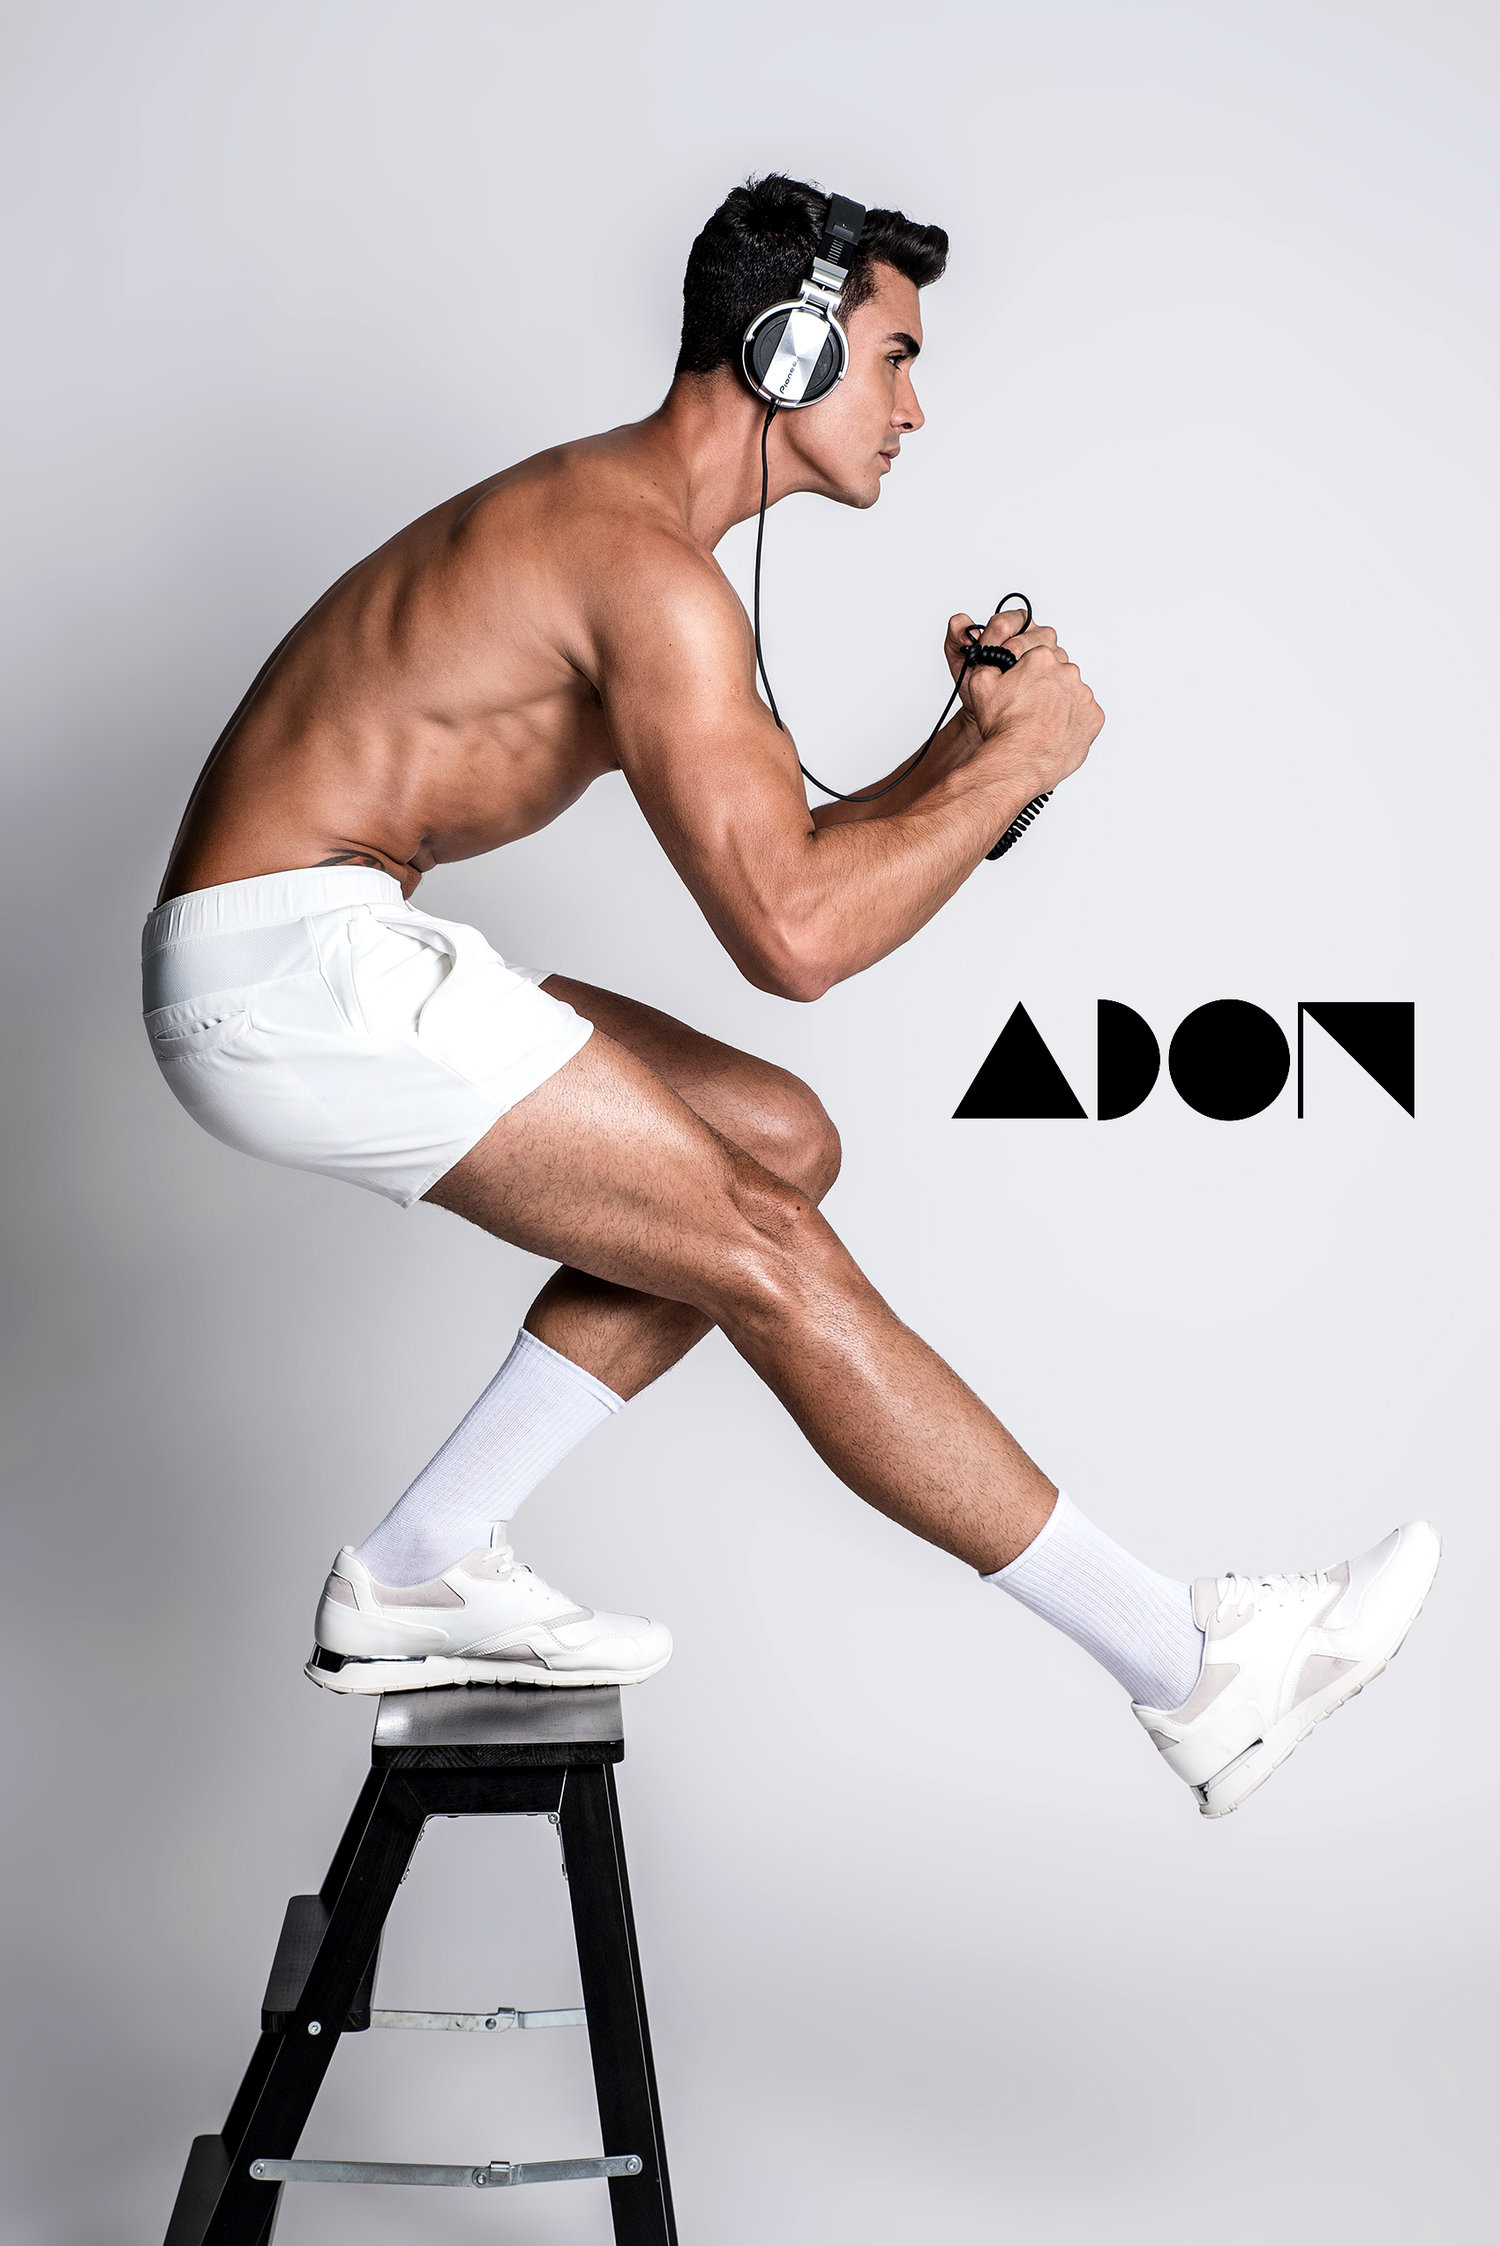 Adon Exclusive: Model Daniel Benjamin By Jeremy Holdenn